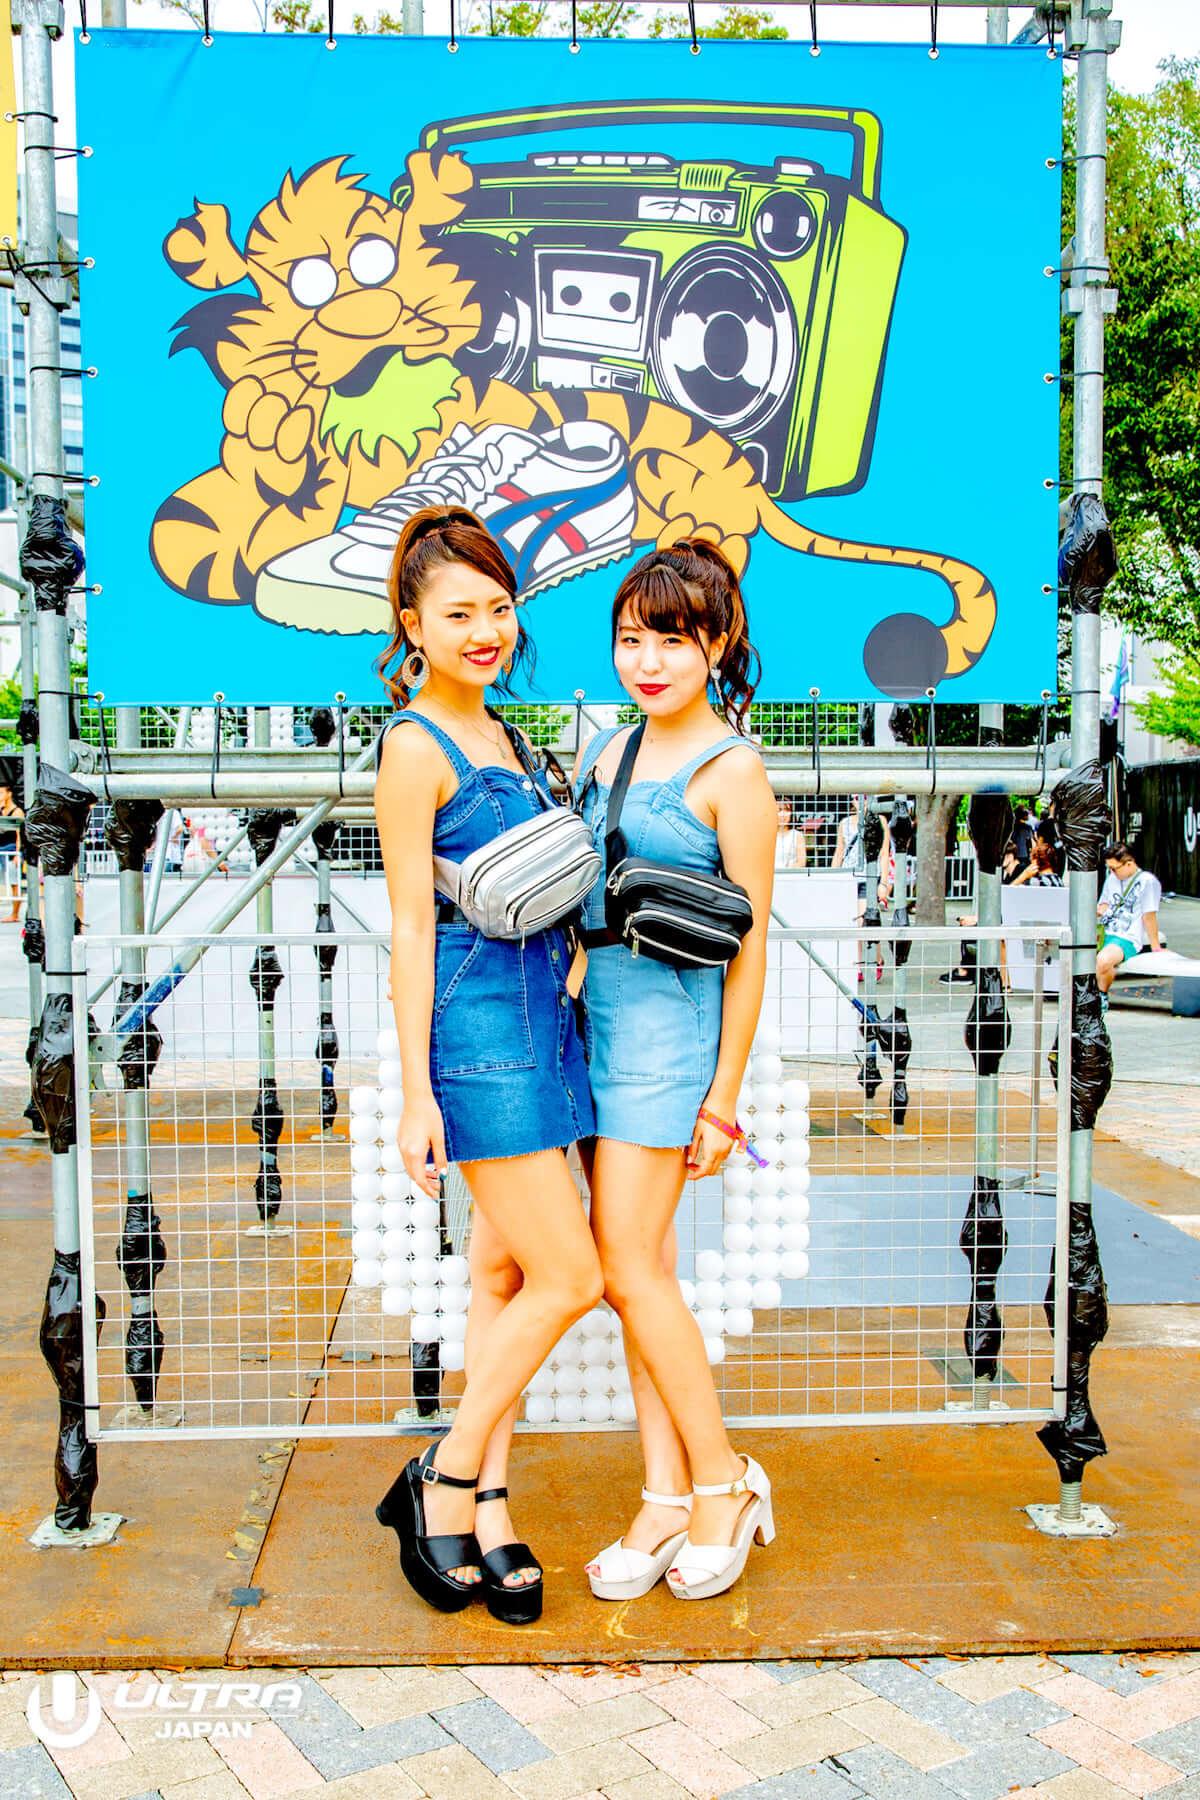 ULTRA JAPAN 2018公式ファッションスナップ到着!今年のトレンドはリンクコーデ? music180918_ultrajapan2018_1_13-1-1200x1800